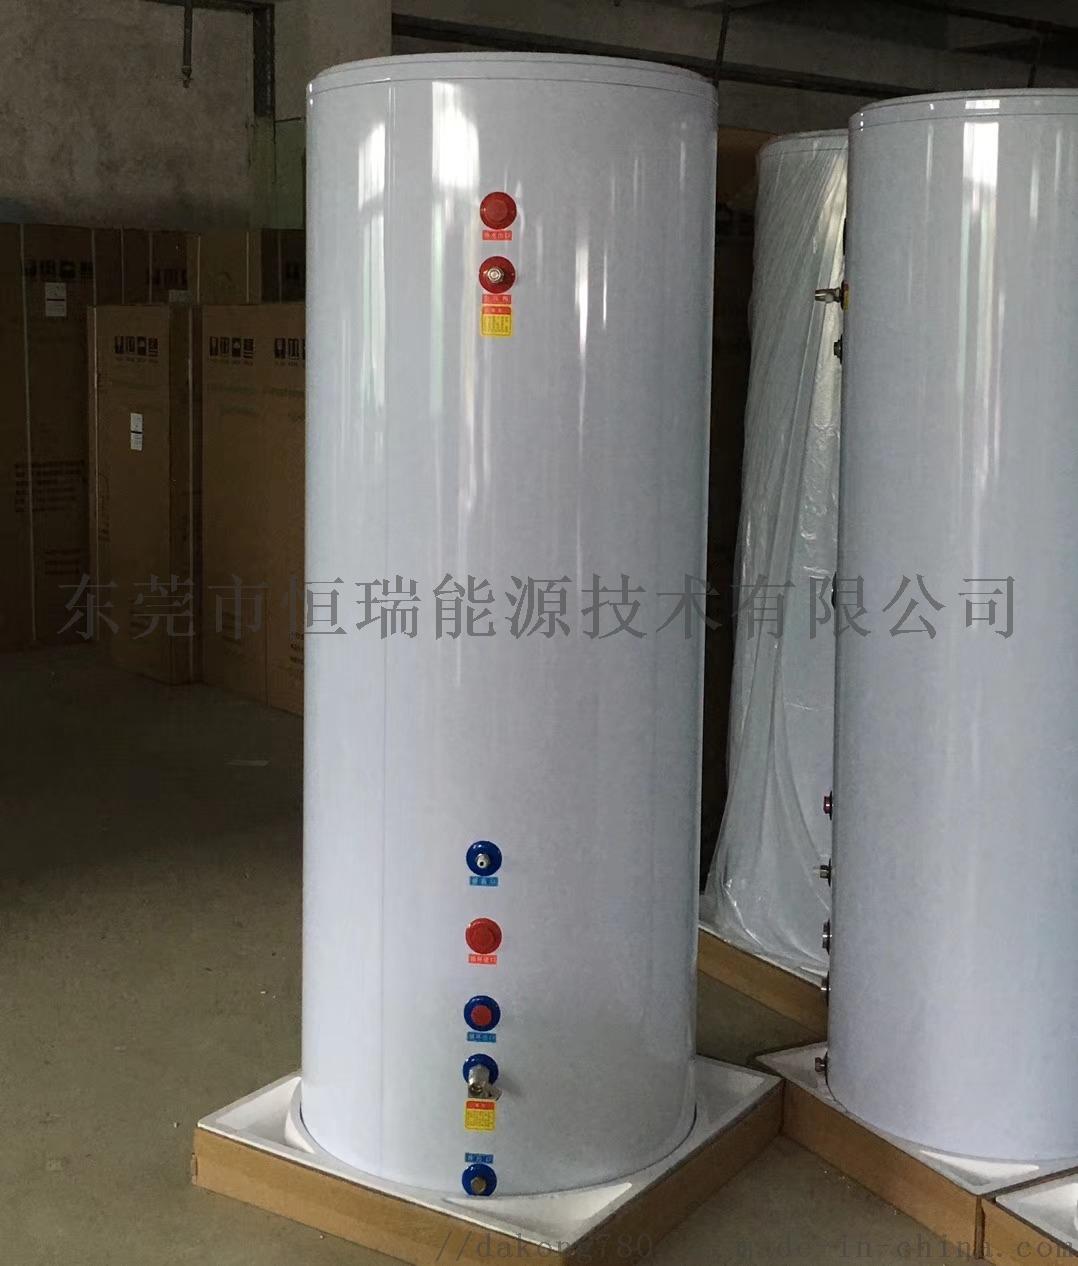 300L空气能热水器保温水箱 水循环主机储水箱804236475